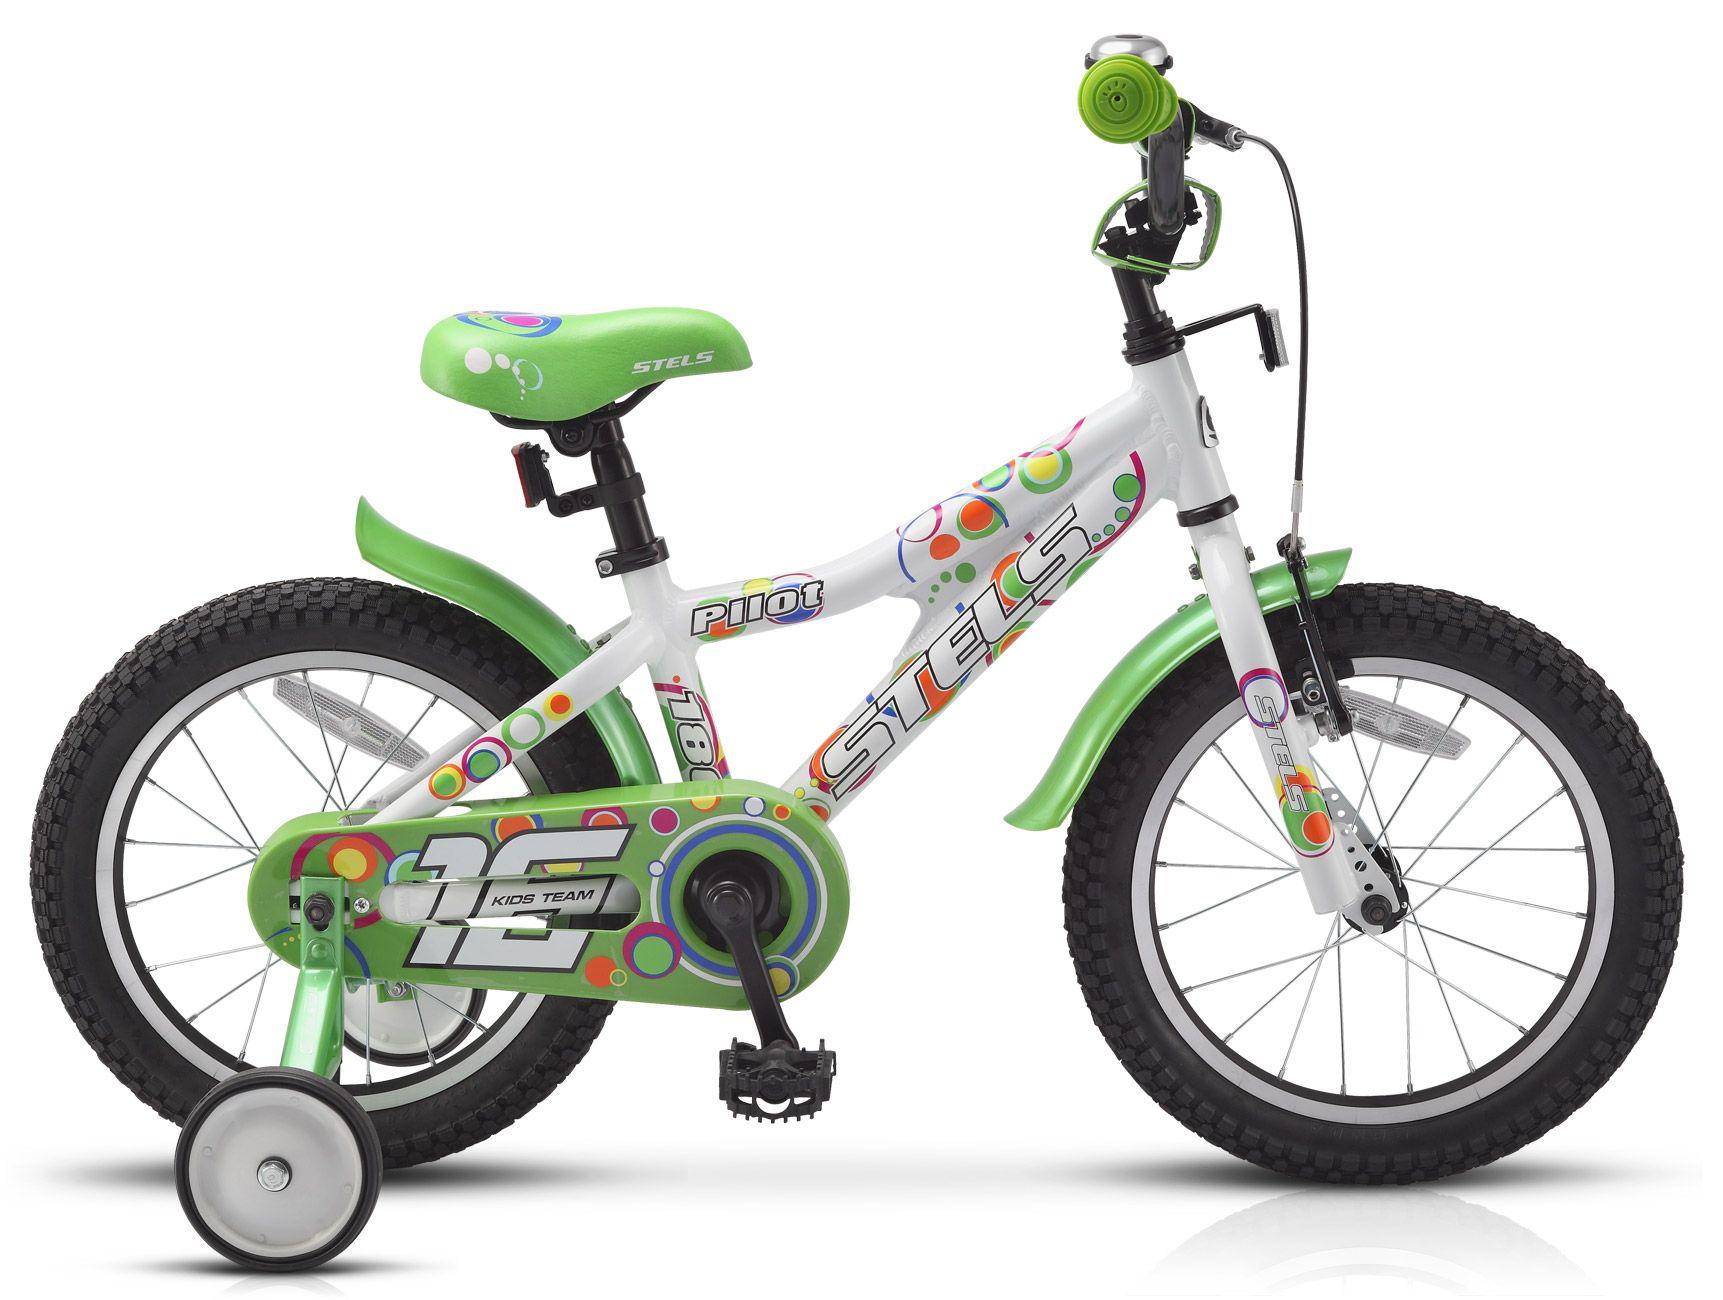 Велосипед Stels Pilot 180 16 2015 велосипед stels talisman chrome 16 2013